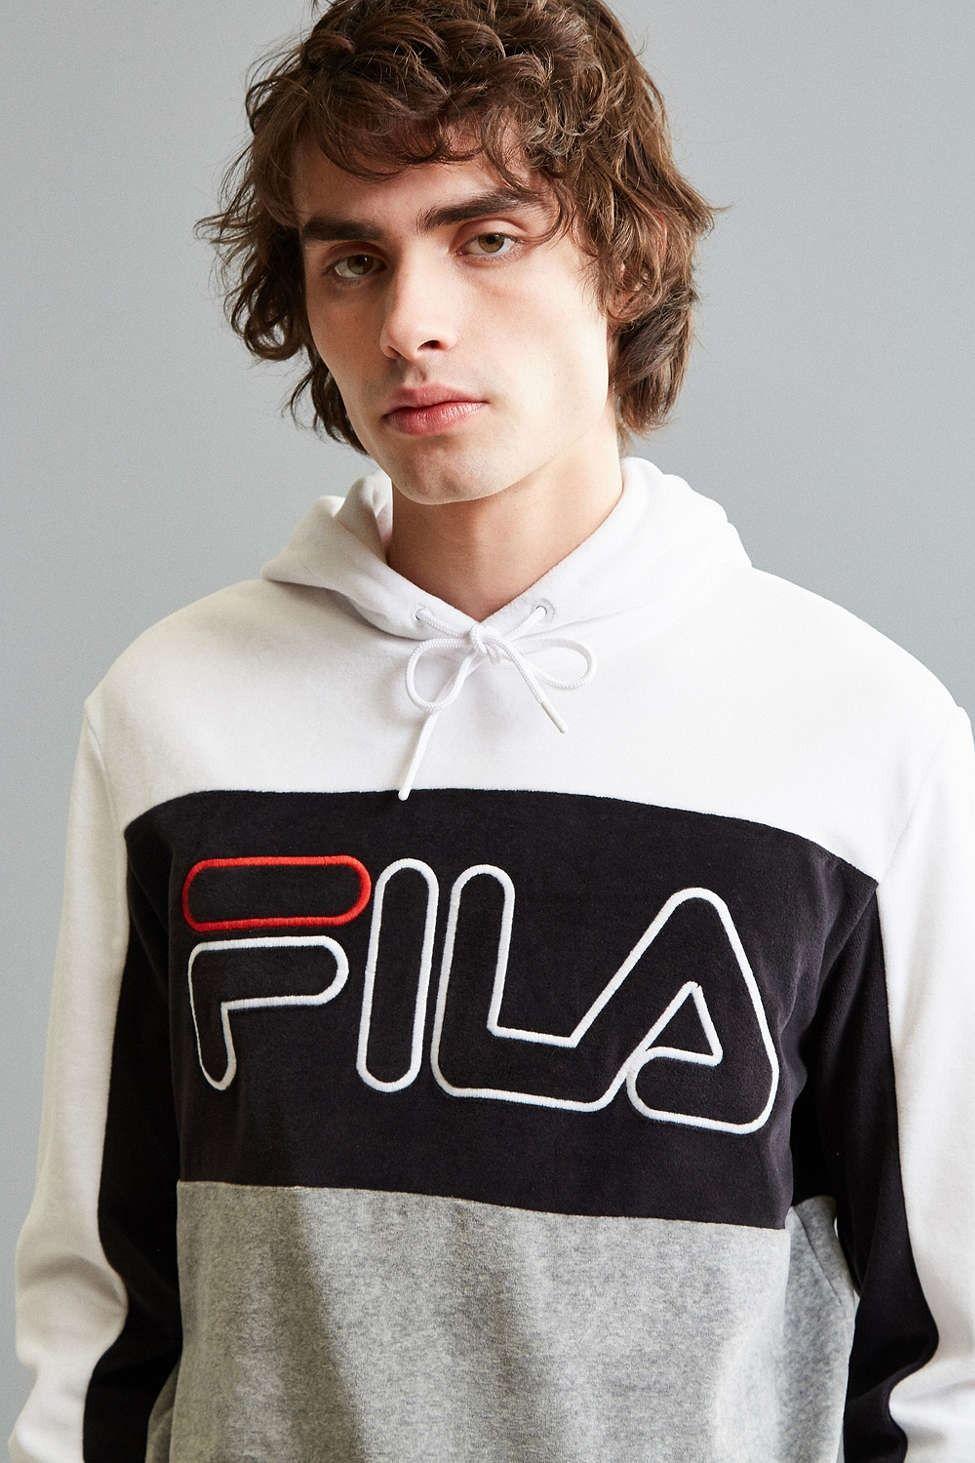 FILA Velour Hoodie Sweatshirt | Klamotten | Fila velour